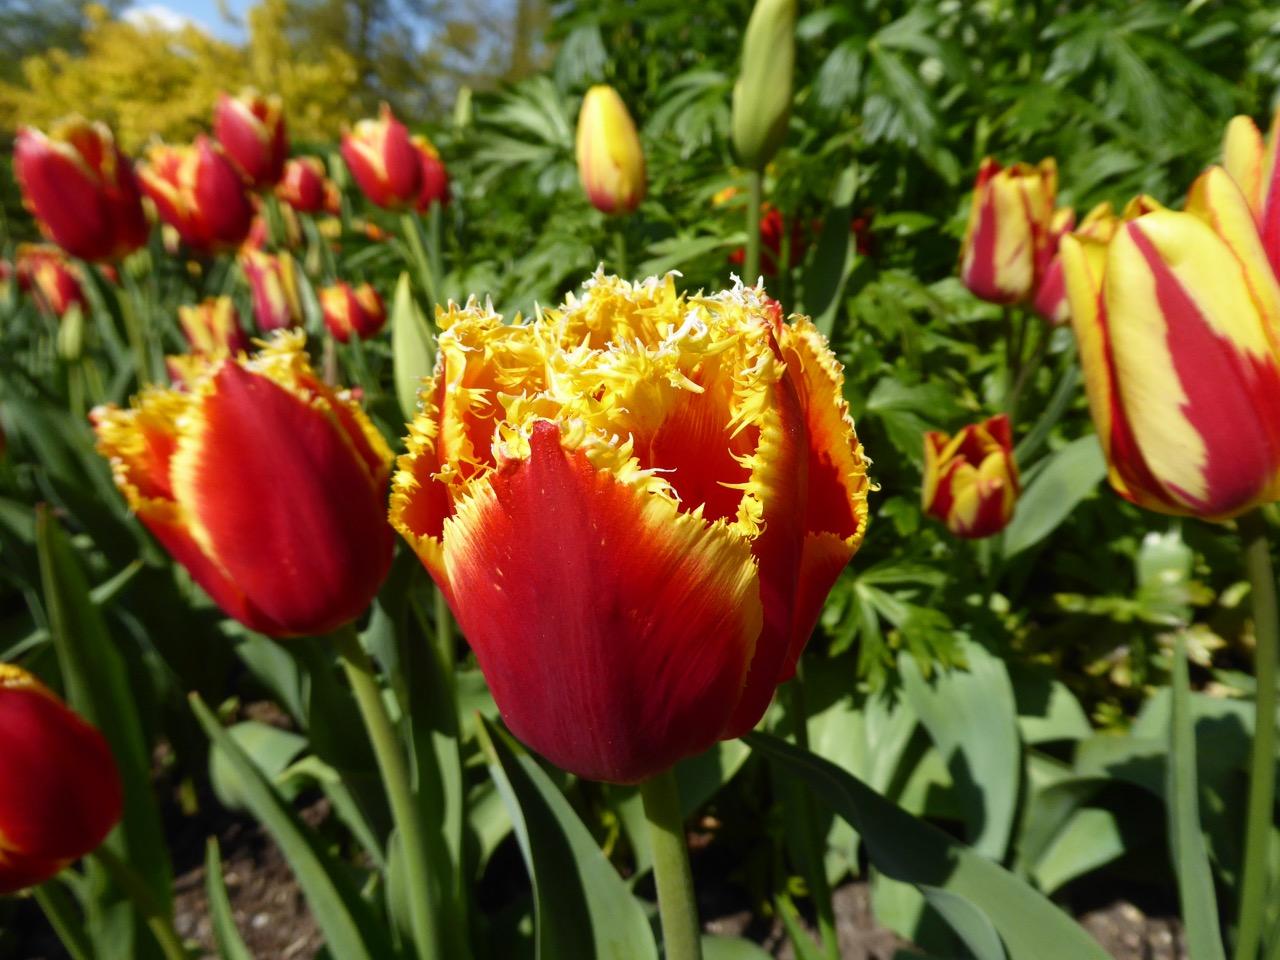 Forde Abbey, Dorset - Tulips